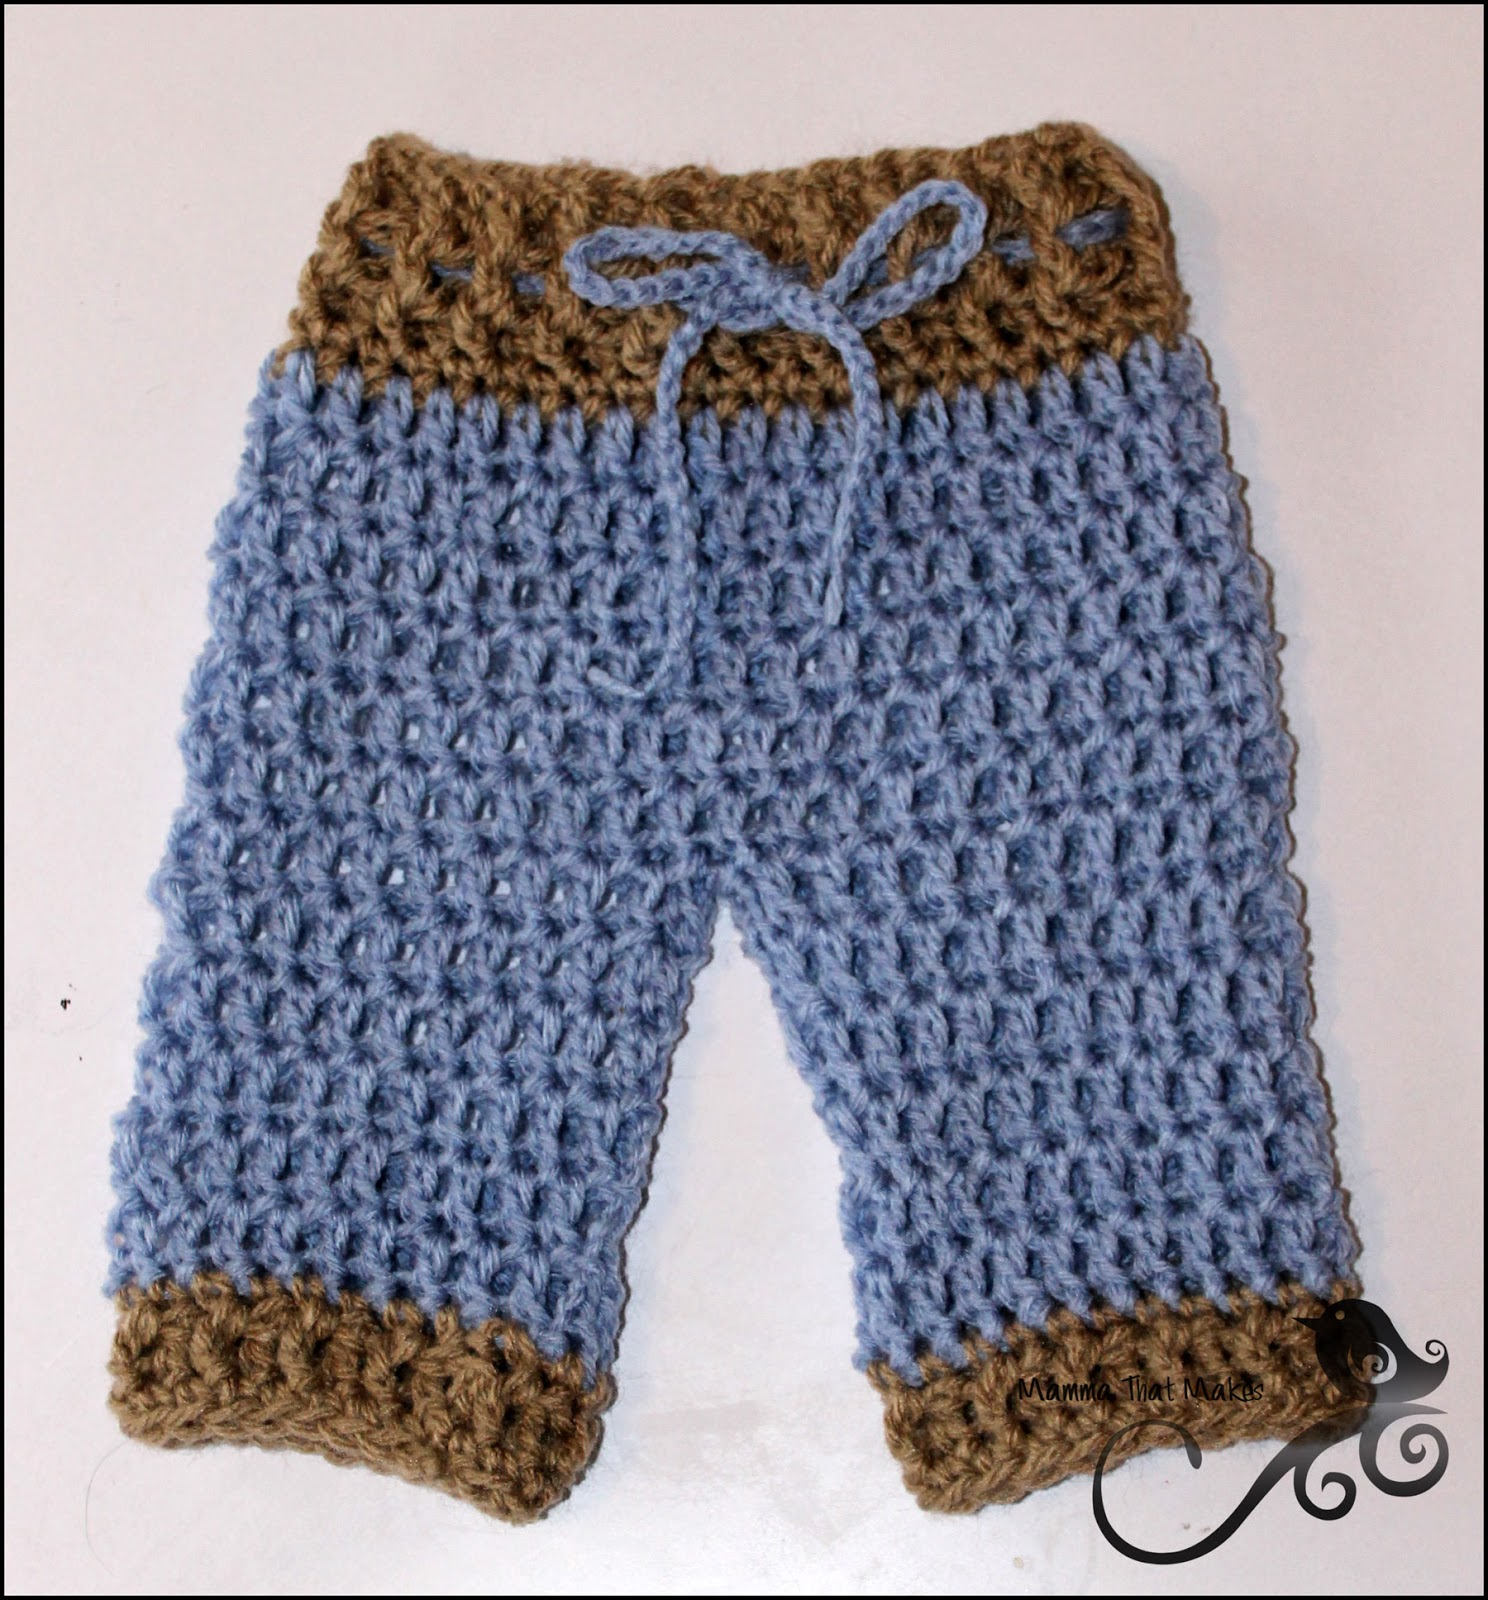 ccfdfa83822d Mamma That Makes  Lil Pants - Free Pattern